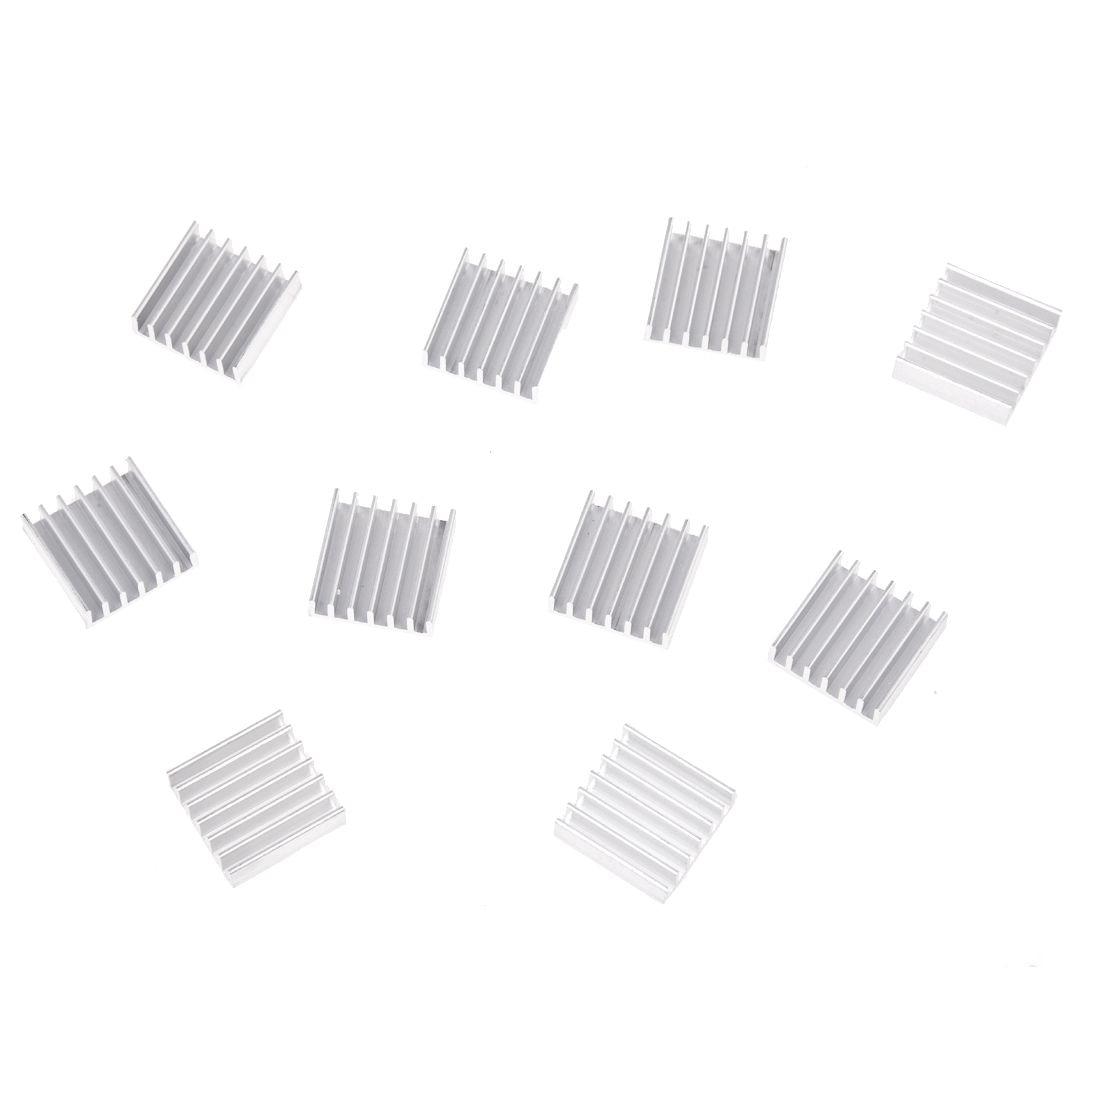 10 Pcs 20mm x 20mm x 6mm Aluminum Heatsink for IC MOSFET SCR10 Pcs 20mm x 20mm x 6mm Aluminum Heatsink for IC MOSFET SCR